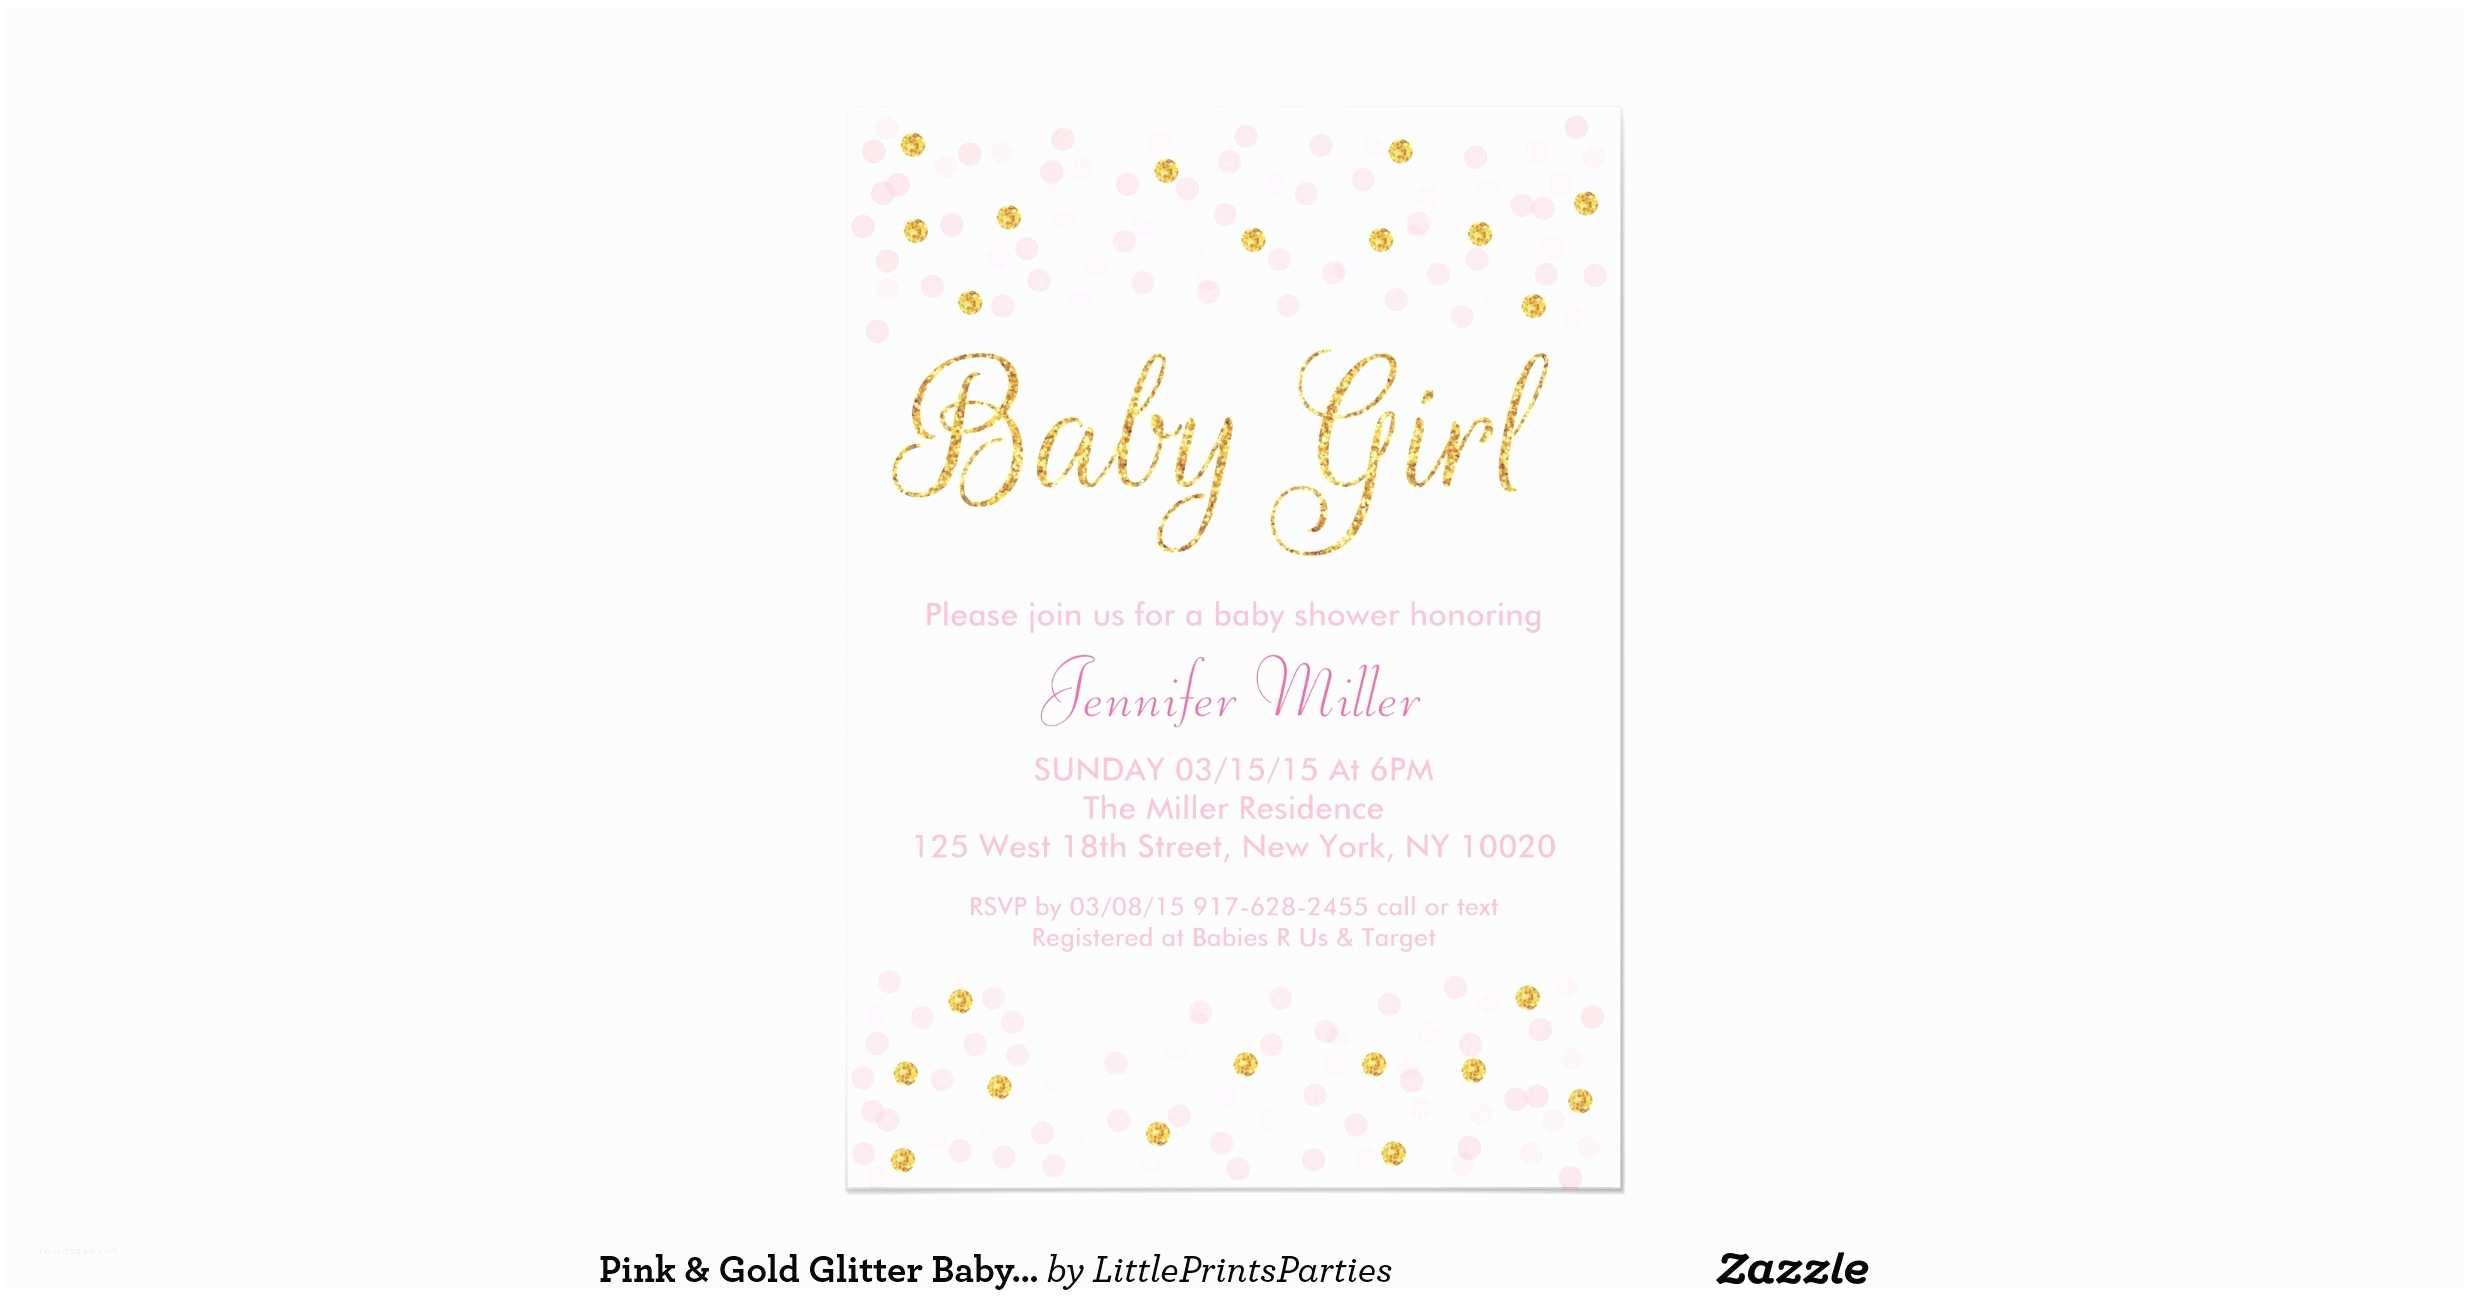 Glitter Baby Shower Invitations Pink Gold Glitter Baby Shower Invitations